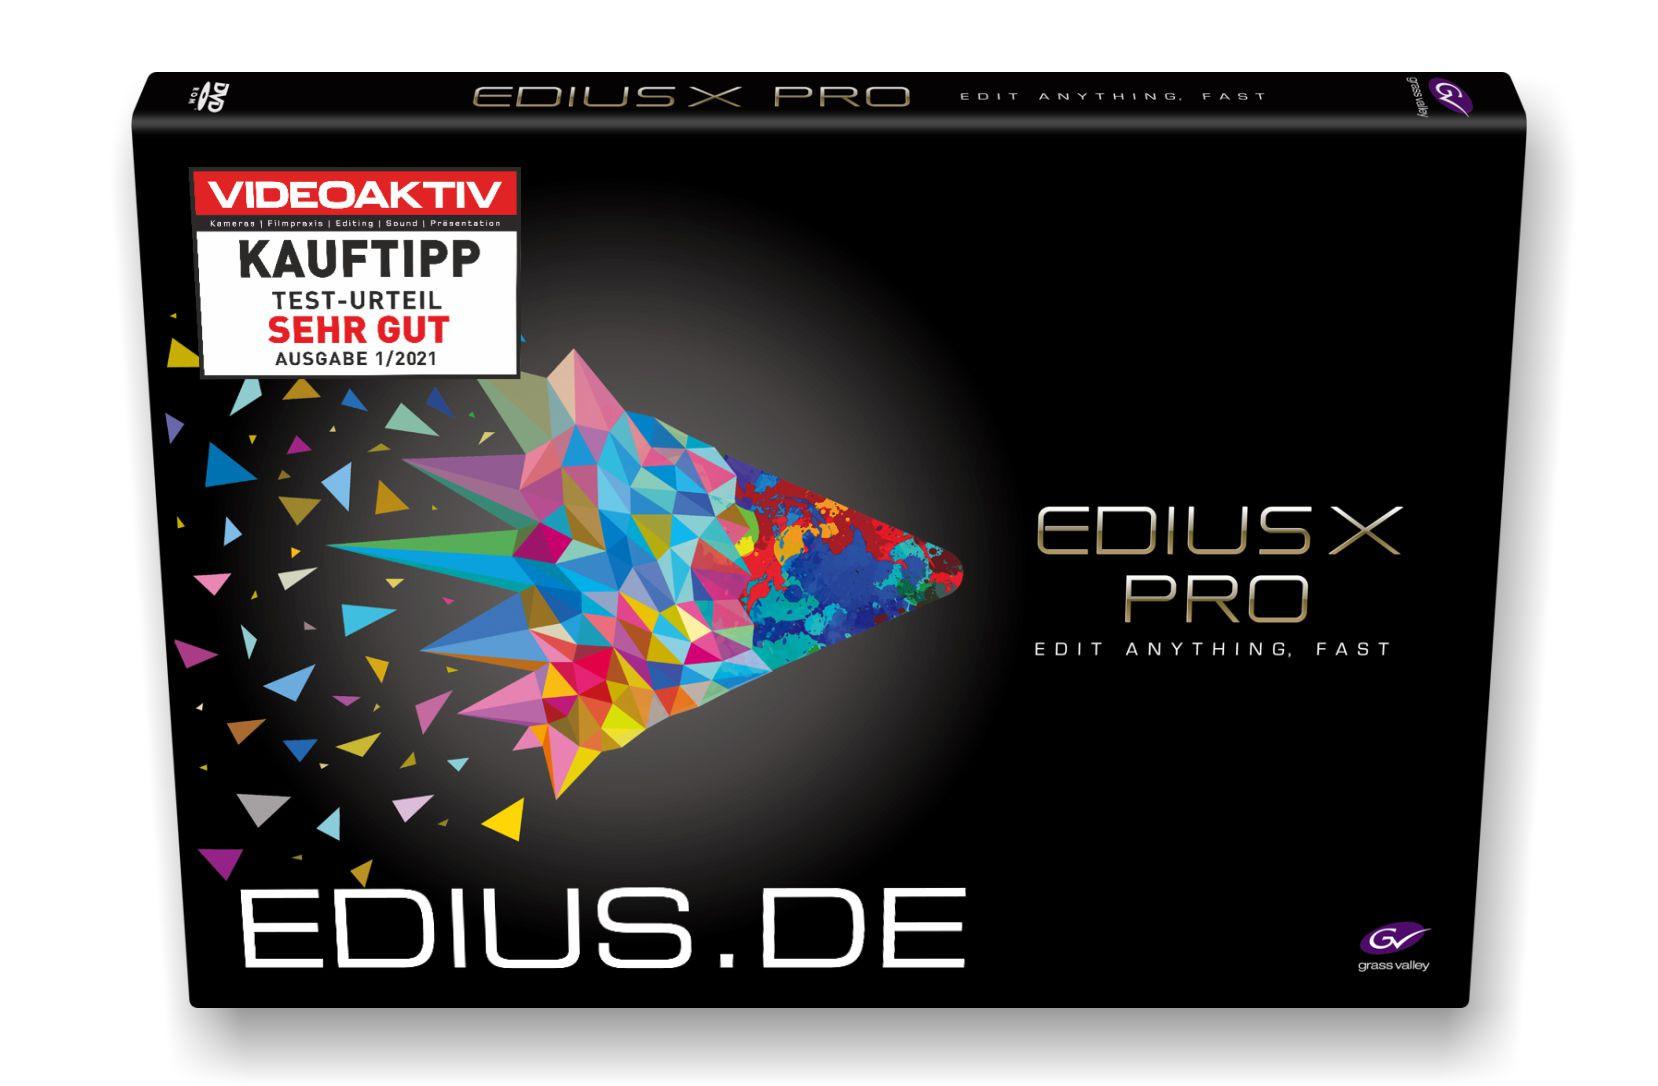 EDIUS X Pro Testsieger